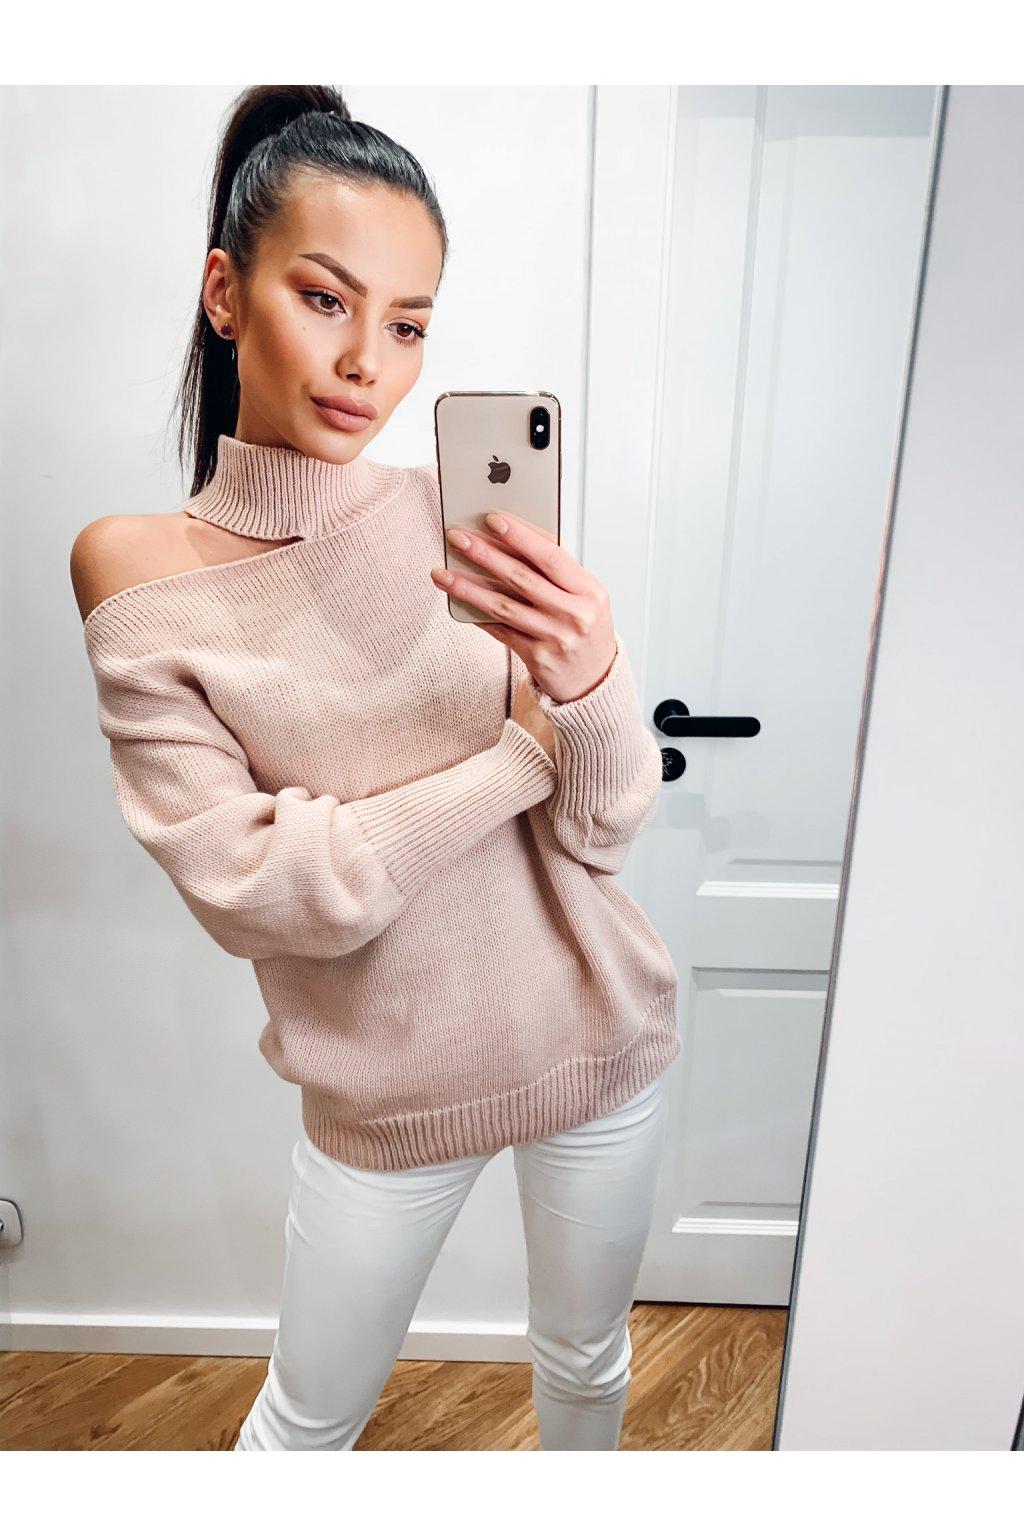 damsky svetr maya powder pink eshopat cz 1